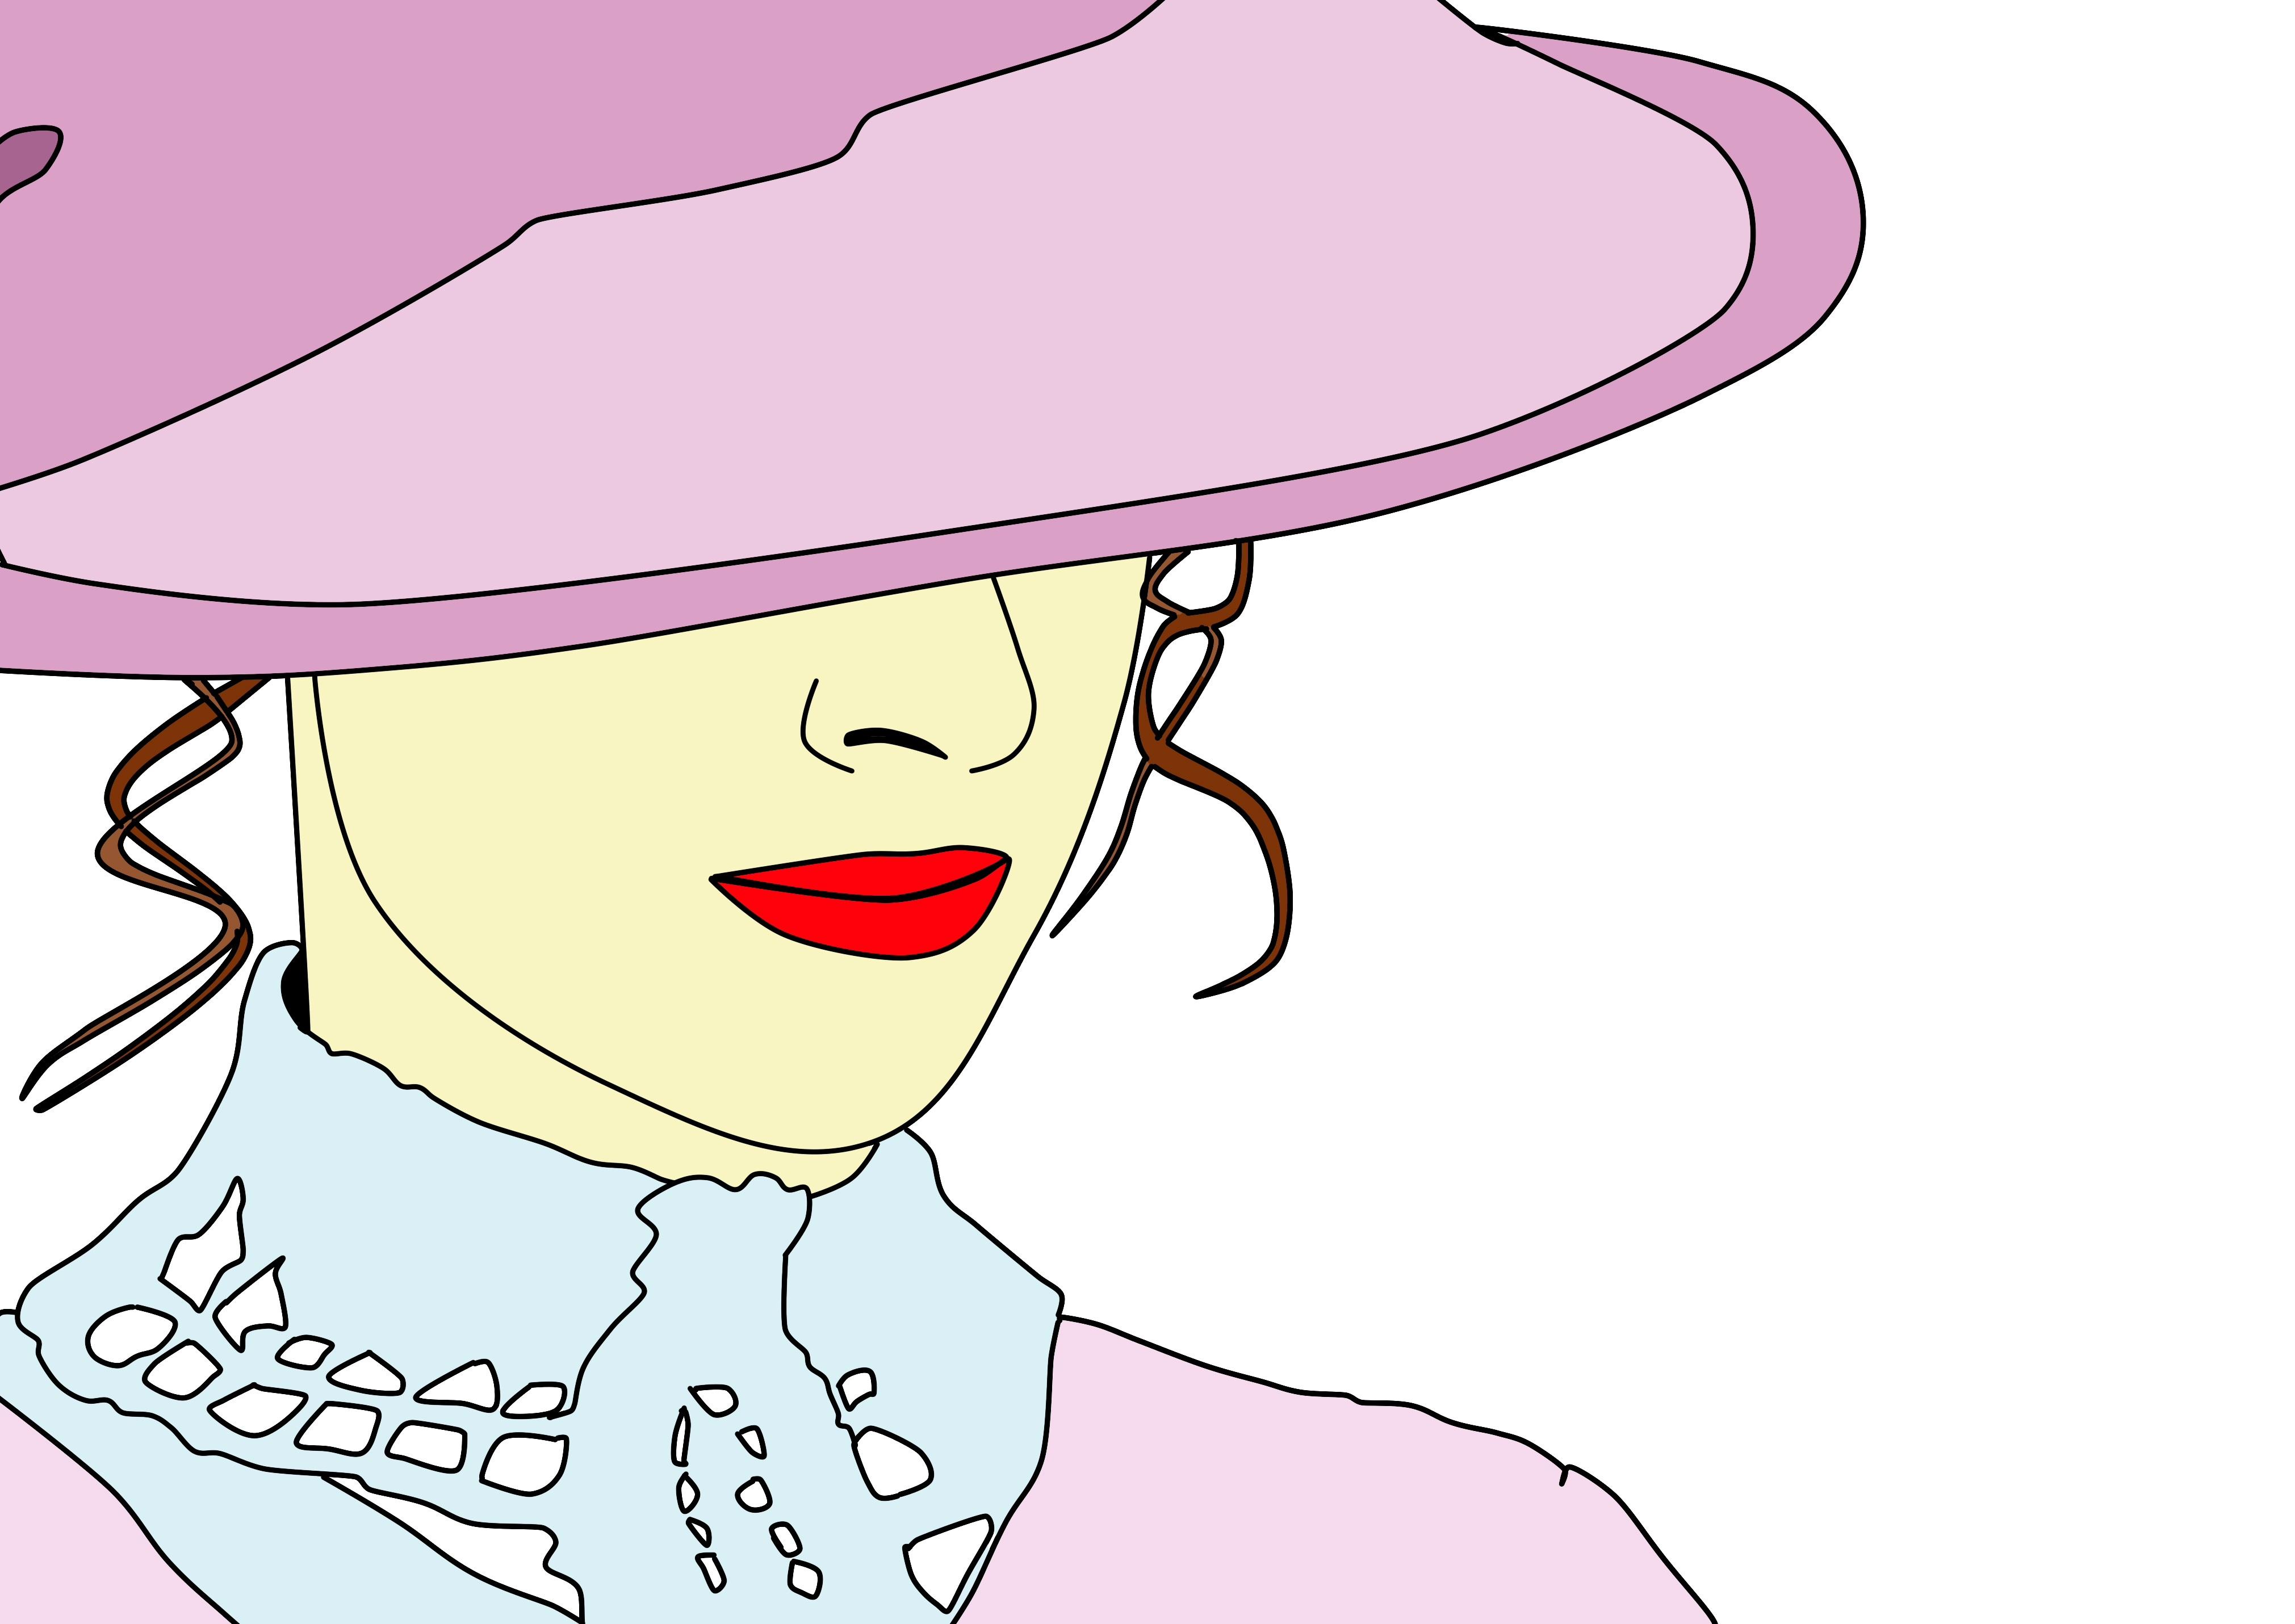 Gambar Wanita Topi Menghadapi Hidung Ilustrasi Victoria